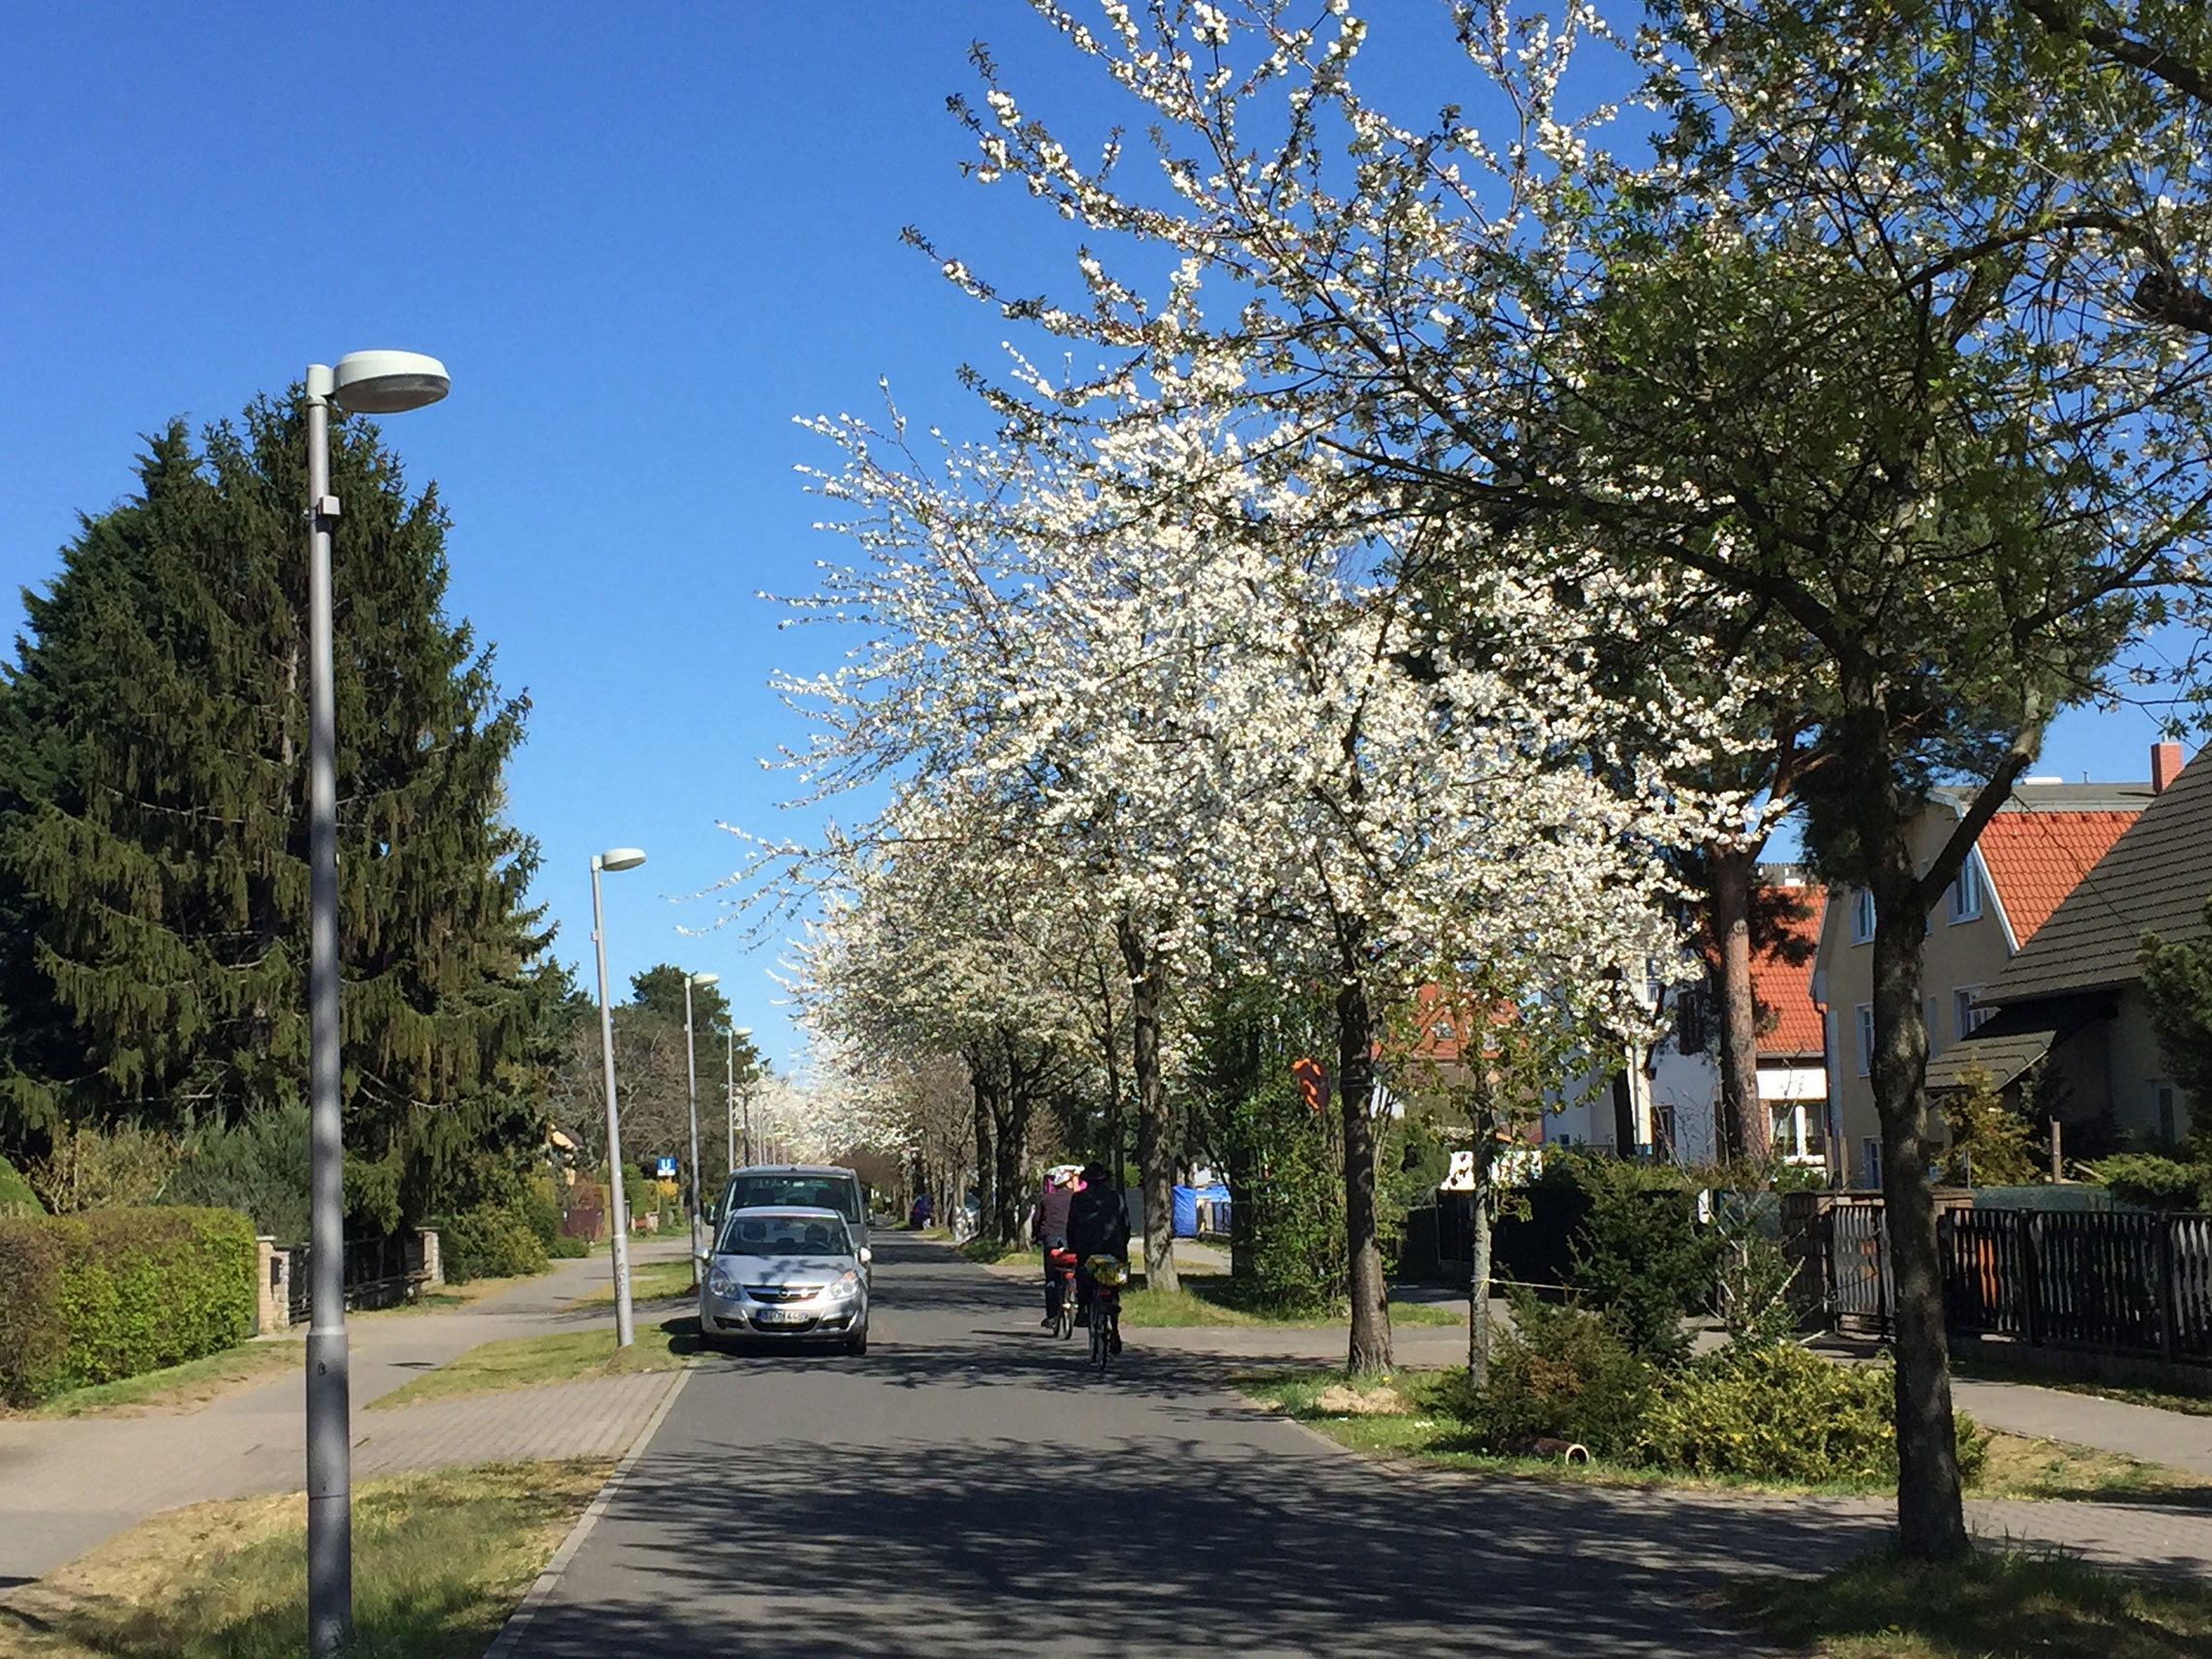 Radtour Kaulsdorfer Weg Berlin